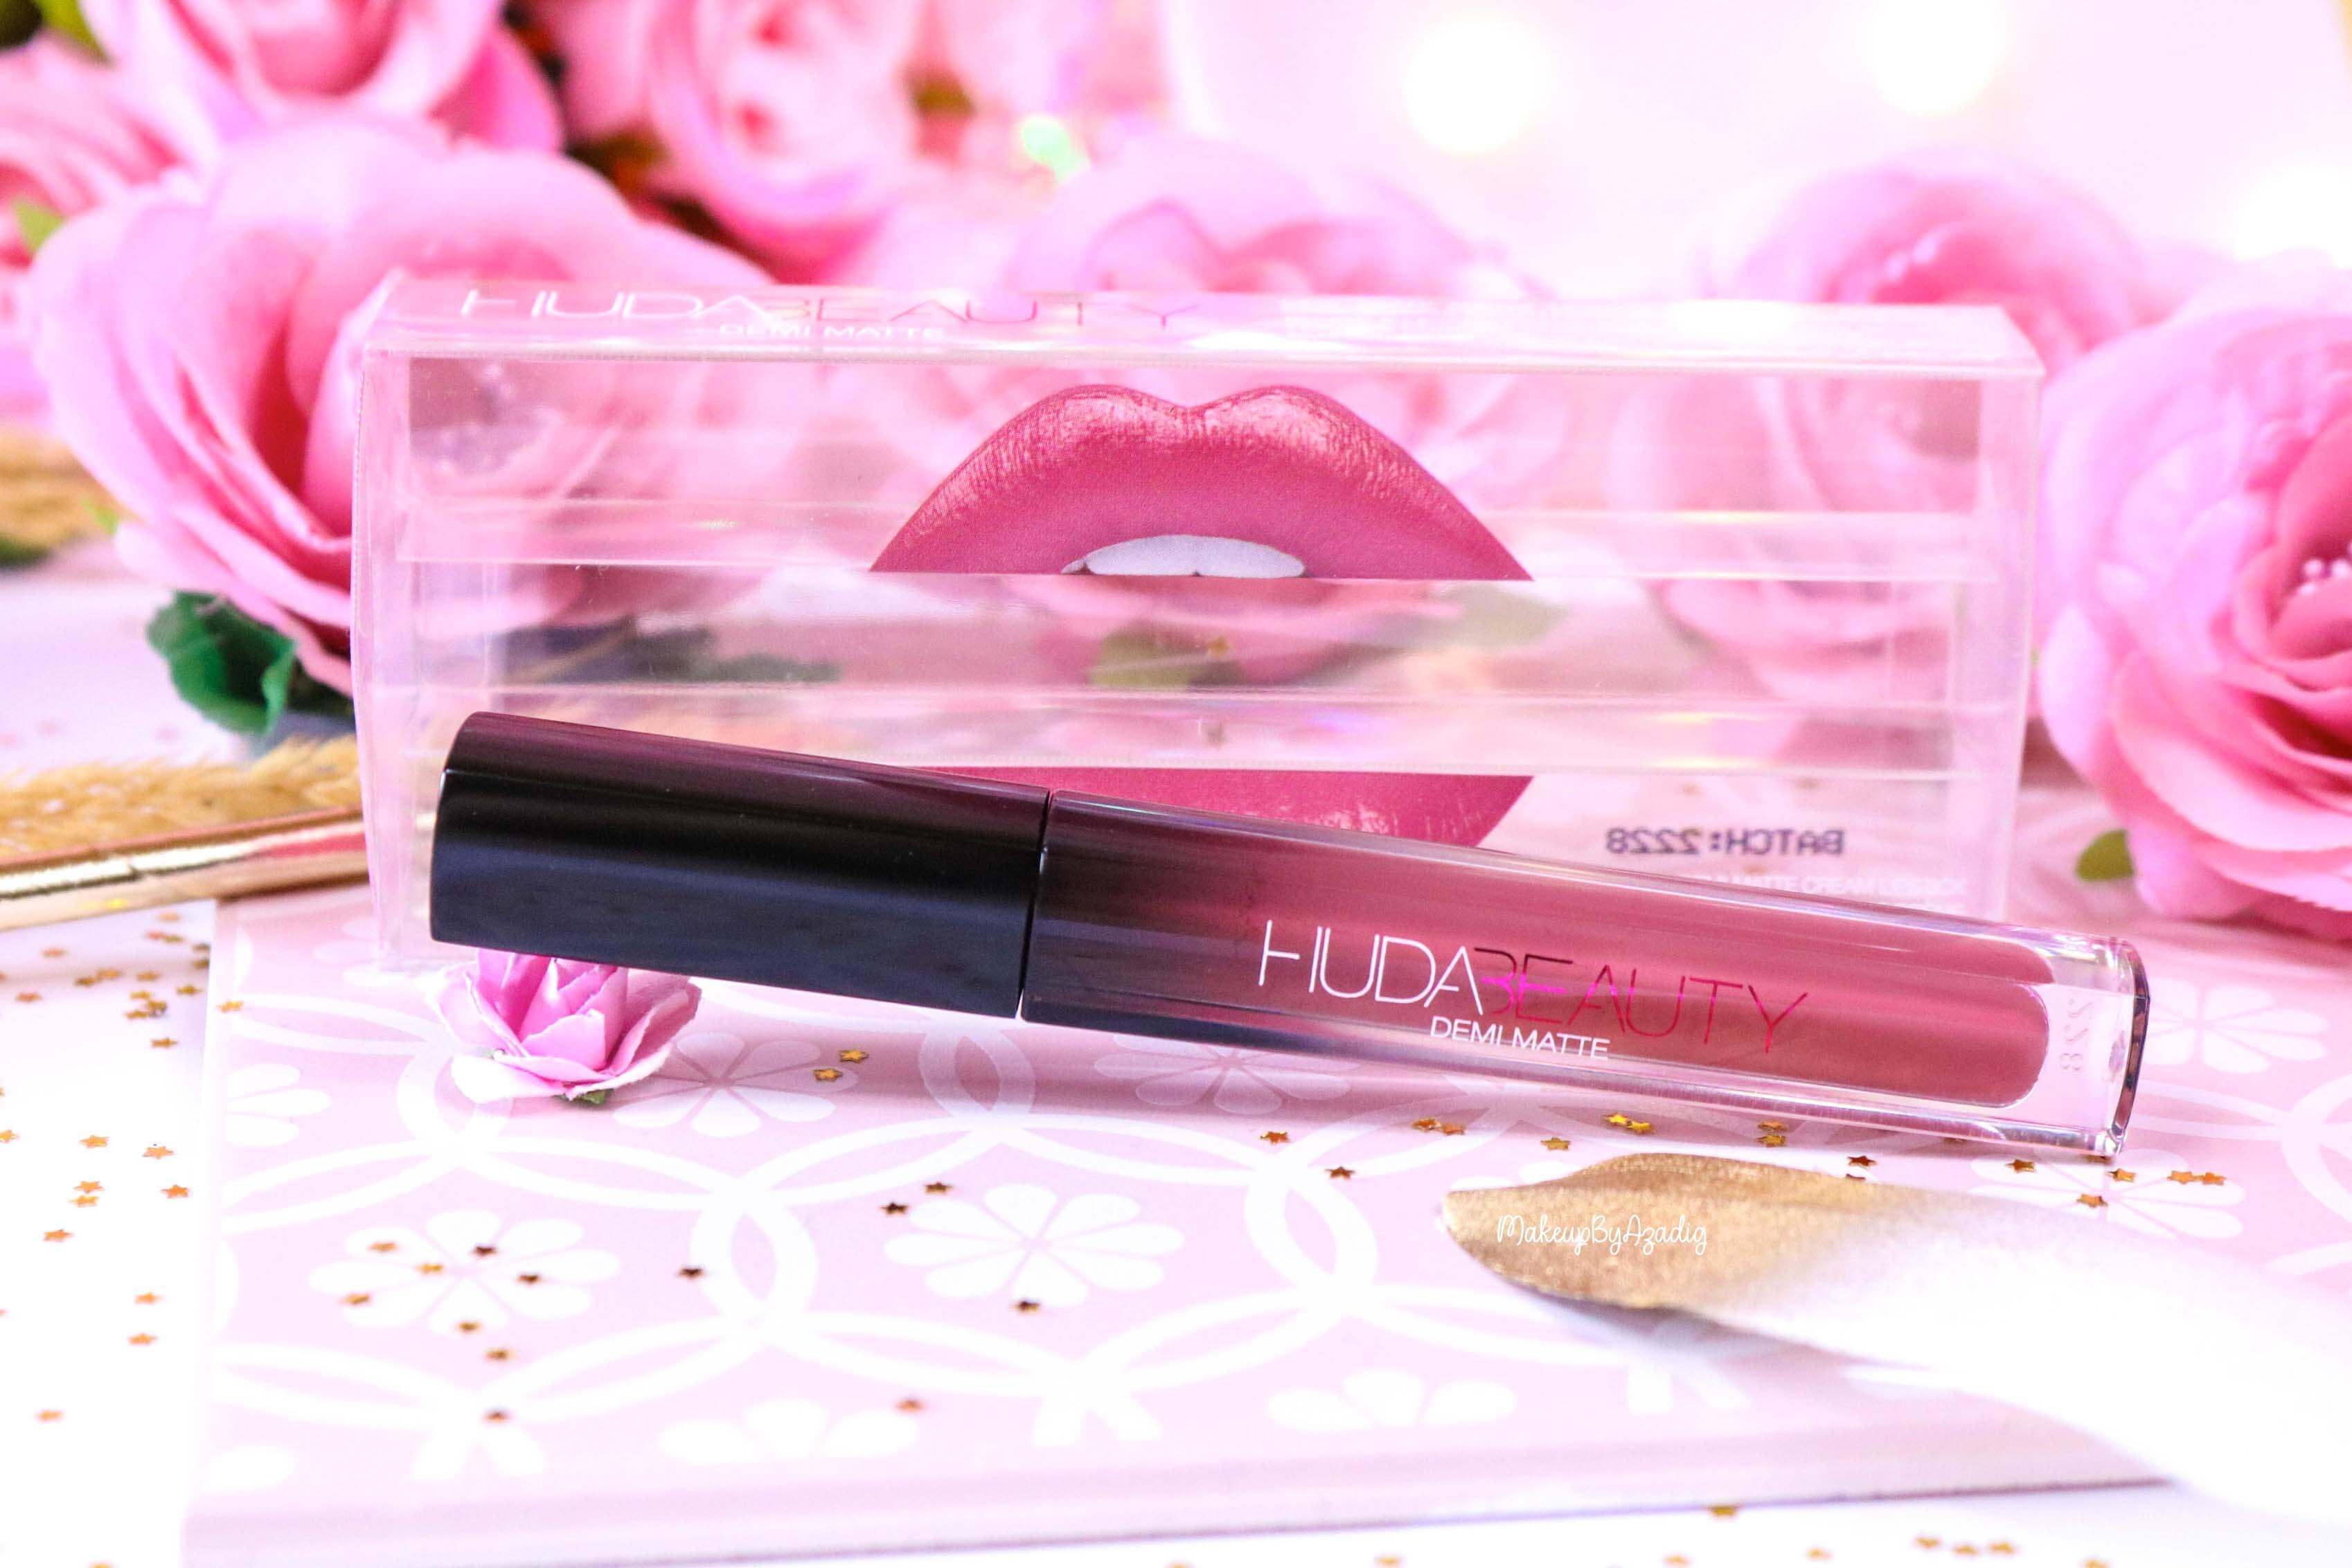 revue-marque-huda-beauty-rouge-a-levres-demi-matte-coffret-avis-prix-sheikha-makeupbyazadig-packaging-2